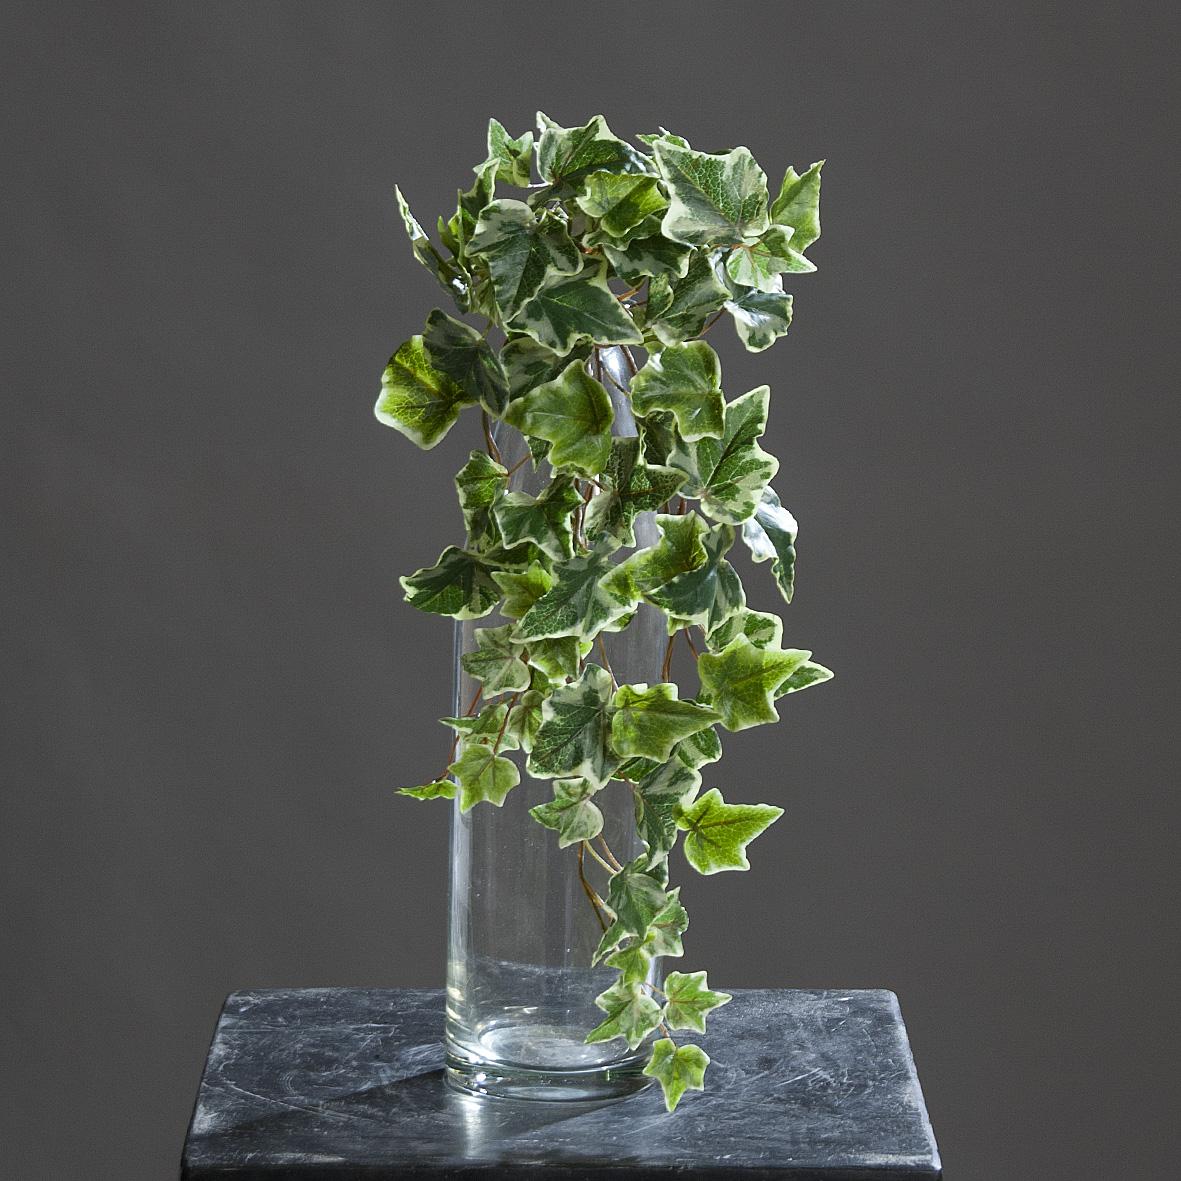 Efeu-Hänger Kunstpflanze Deko grün-weiß 50cm